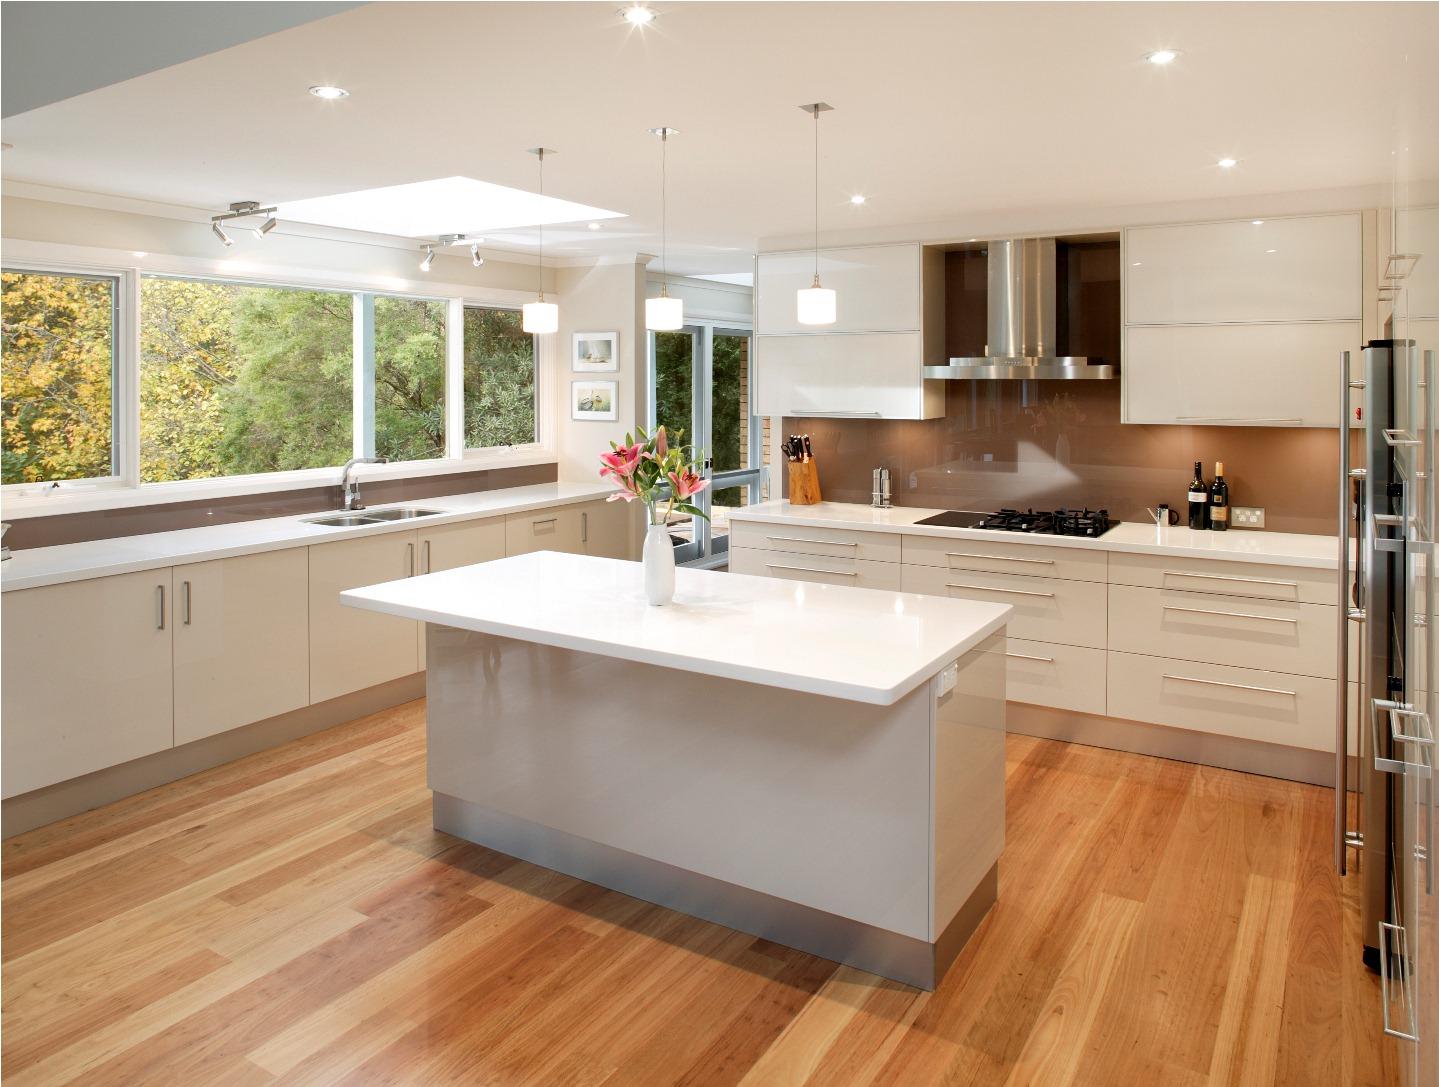 kitchen designs pictures design ideas photo - 3